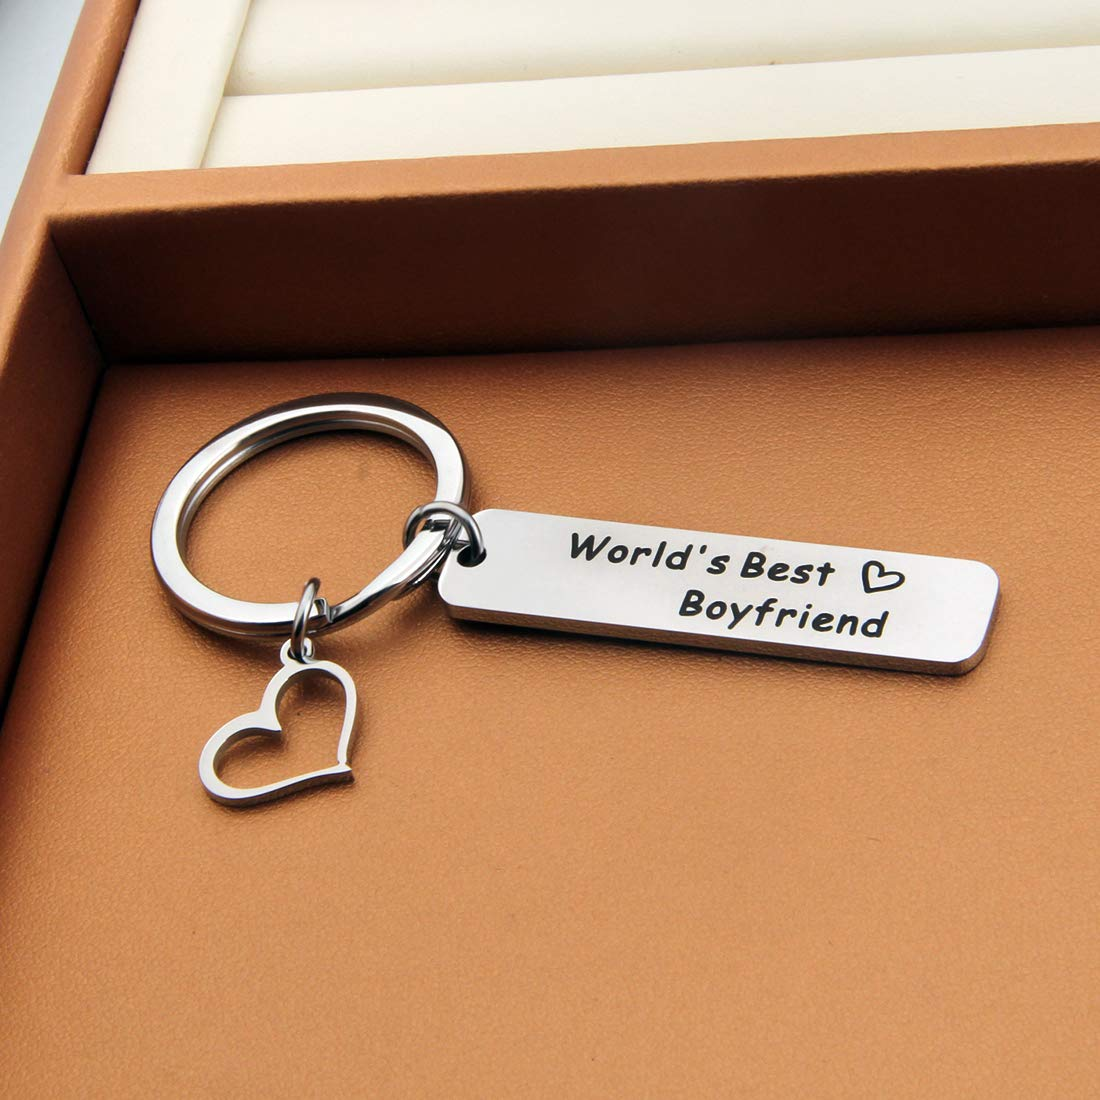 HOLLP Worlds Best Boyfriend//Girlfriend Couple Keychain for Lovers Anniversary Jewelry from Your Girlfriend//Girlfriend